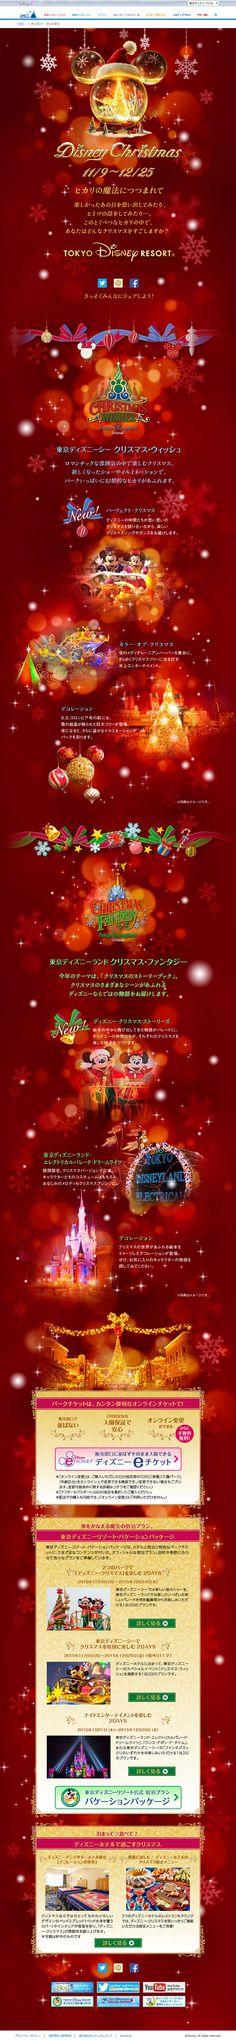 Disney Christmas2015